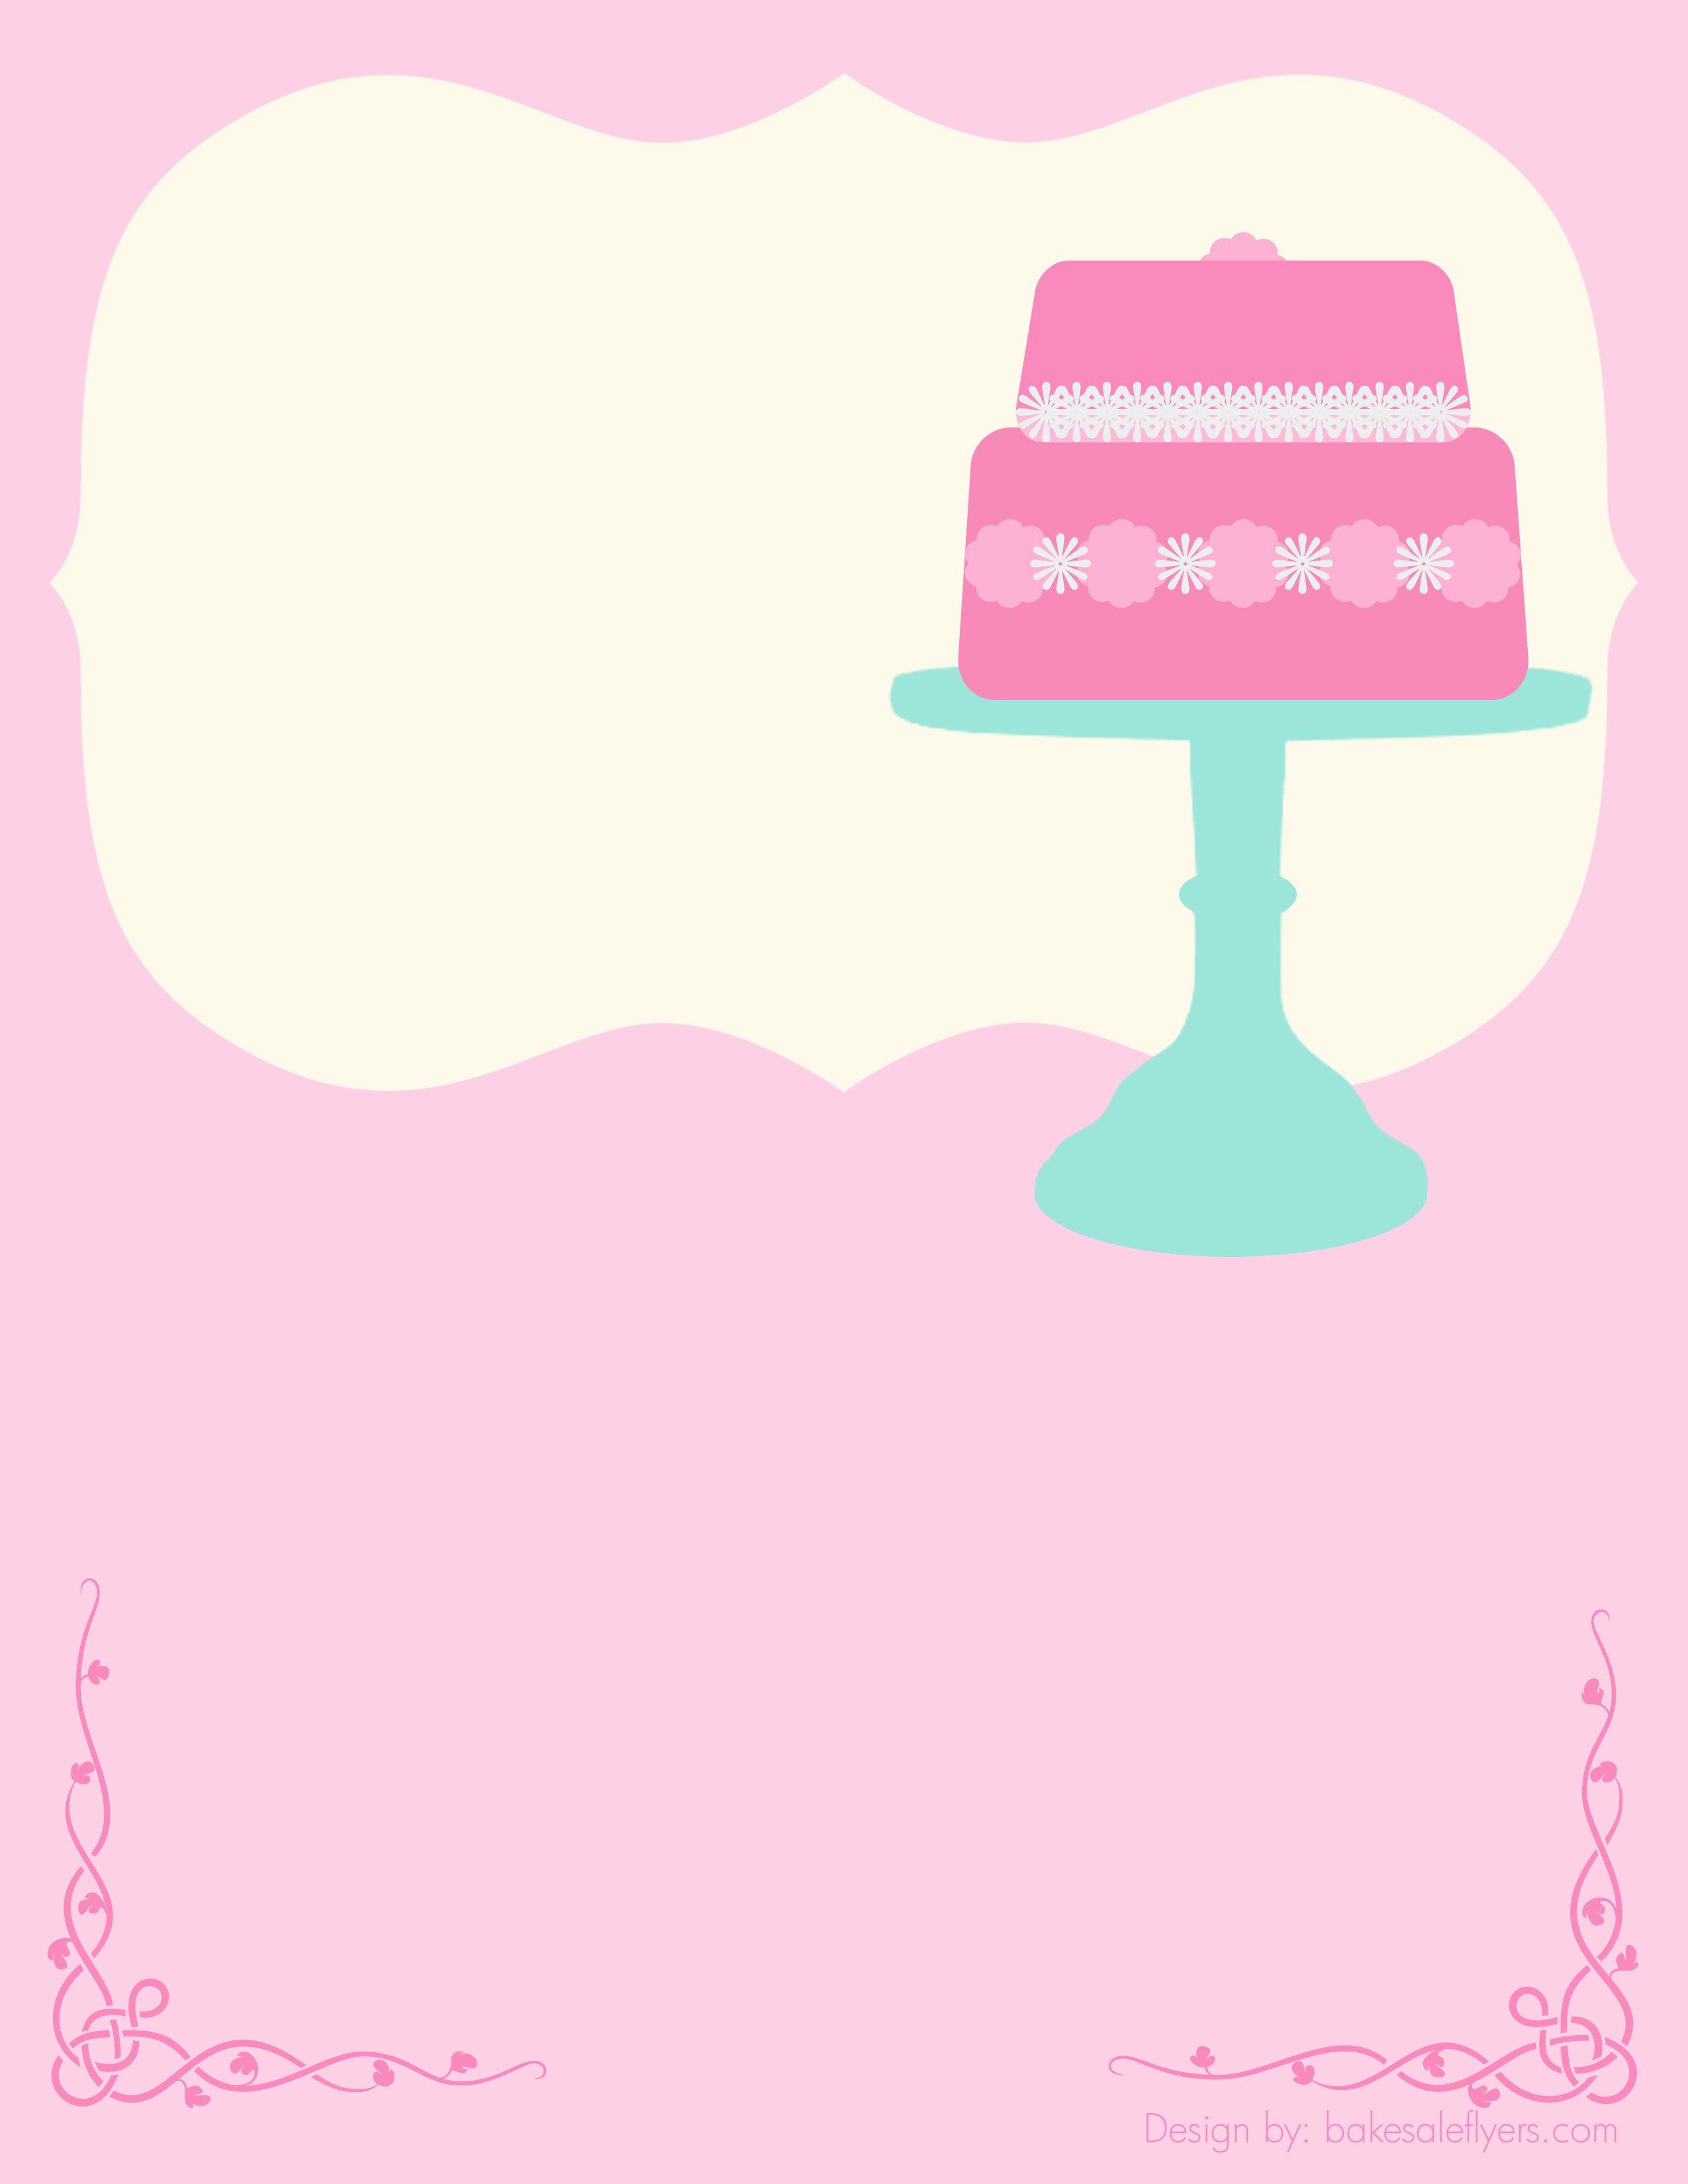 Bake Sale Flyer Templates Free Elegant Bake Sale Flyers – Free Flyer Designs